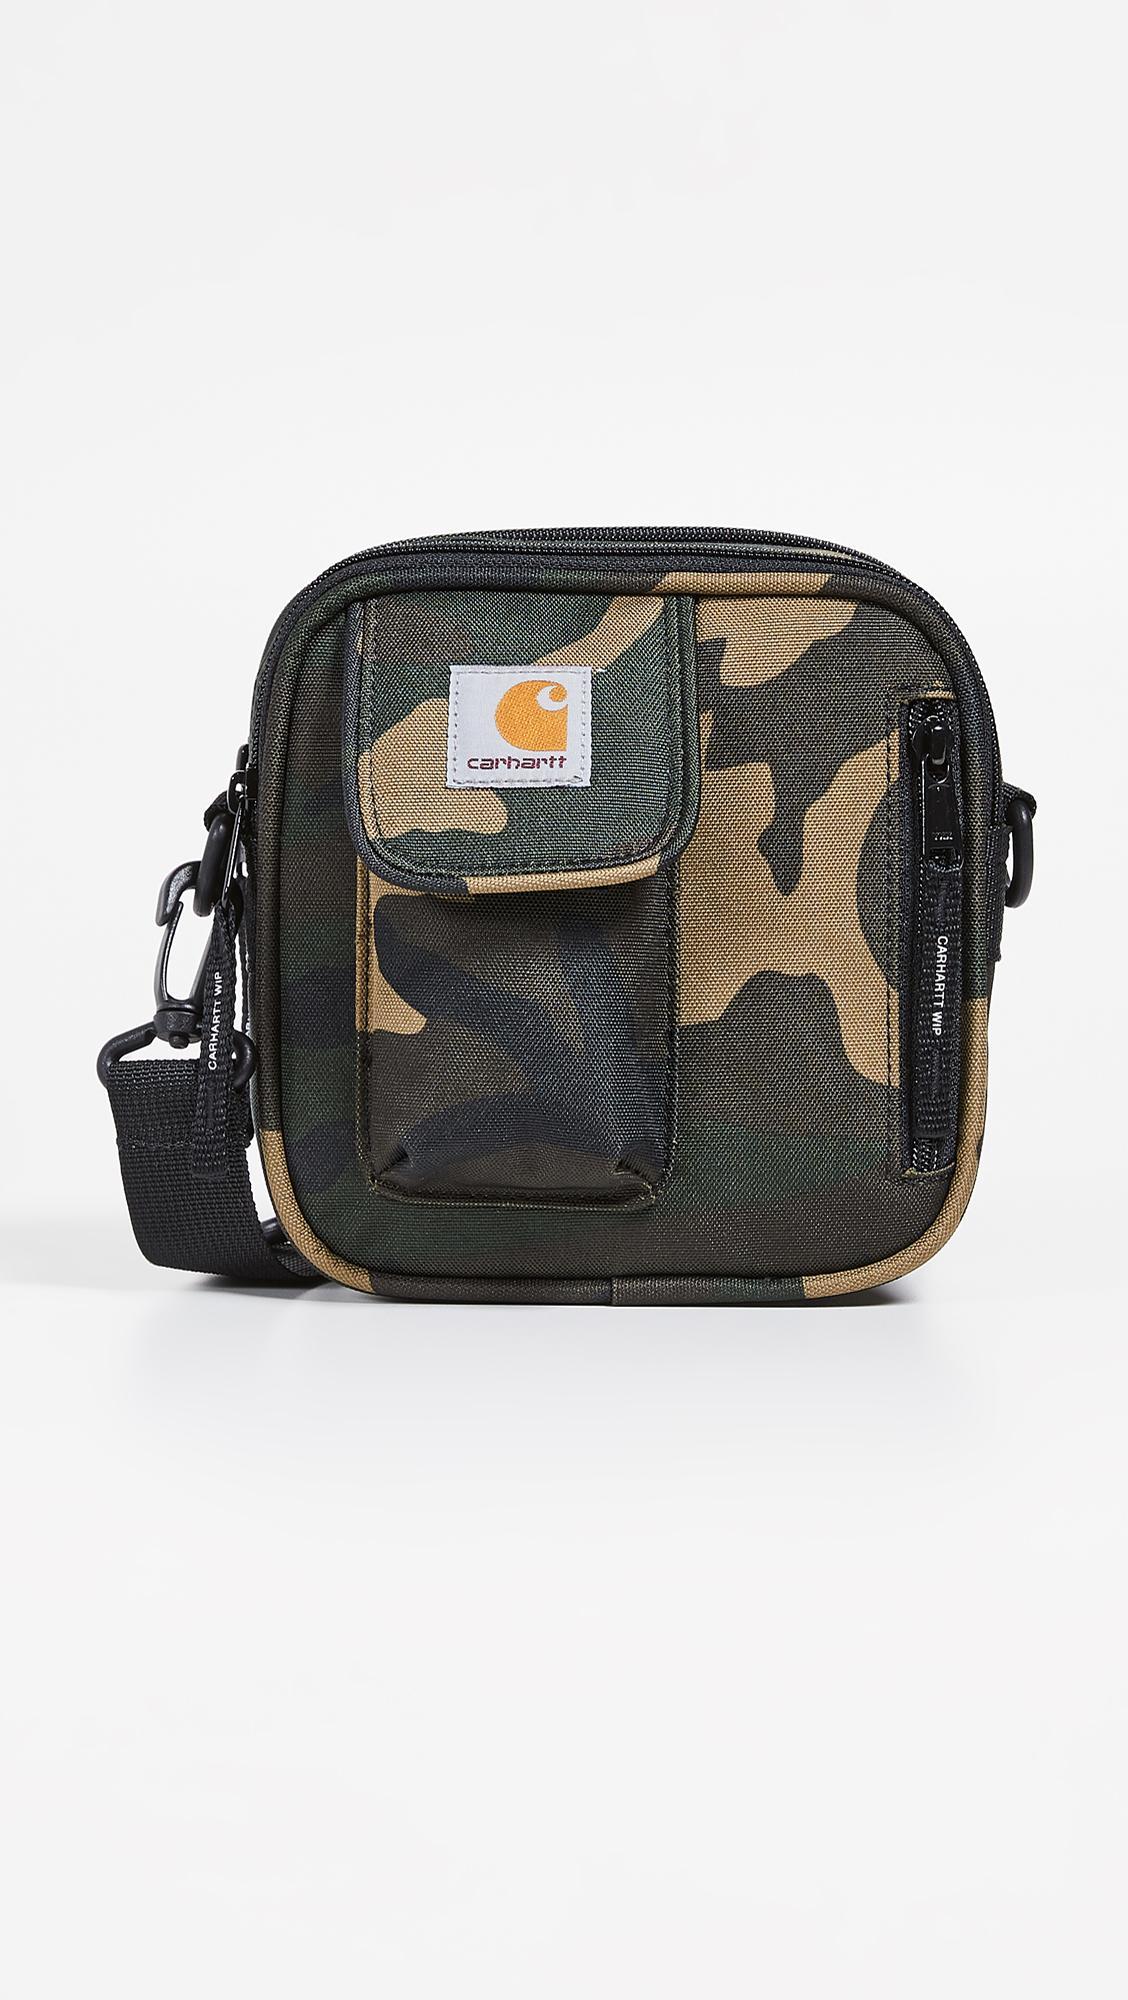 Lyst - Carhartt WIP Small Essentials Bag for Men 5119ef9b02623